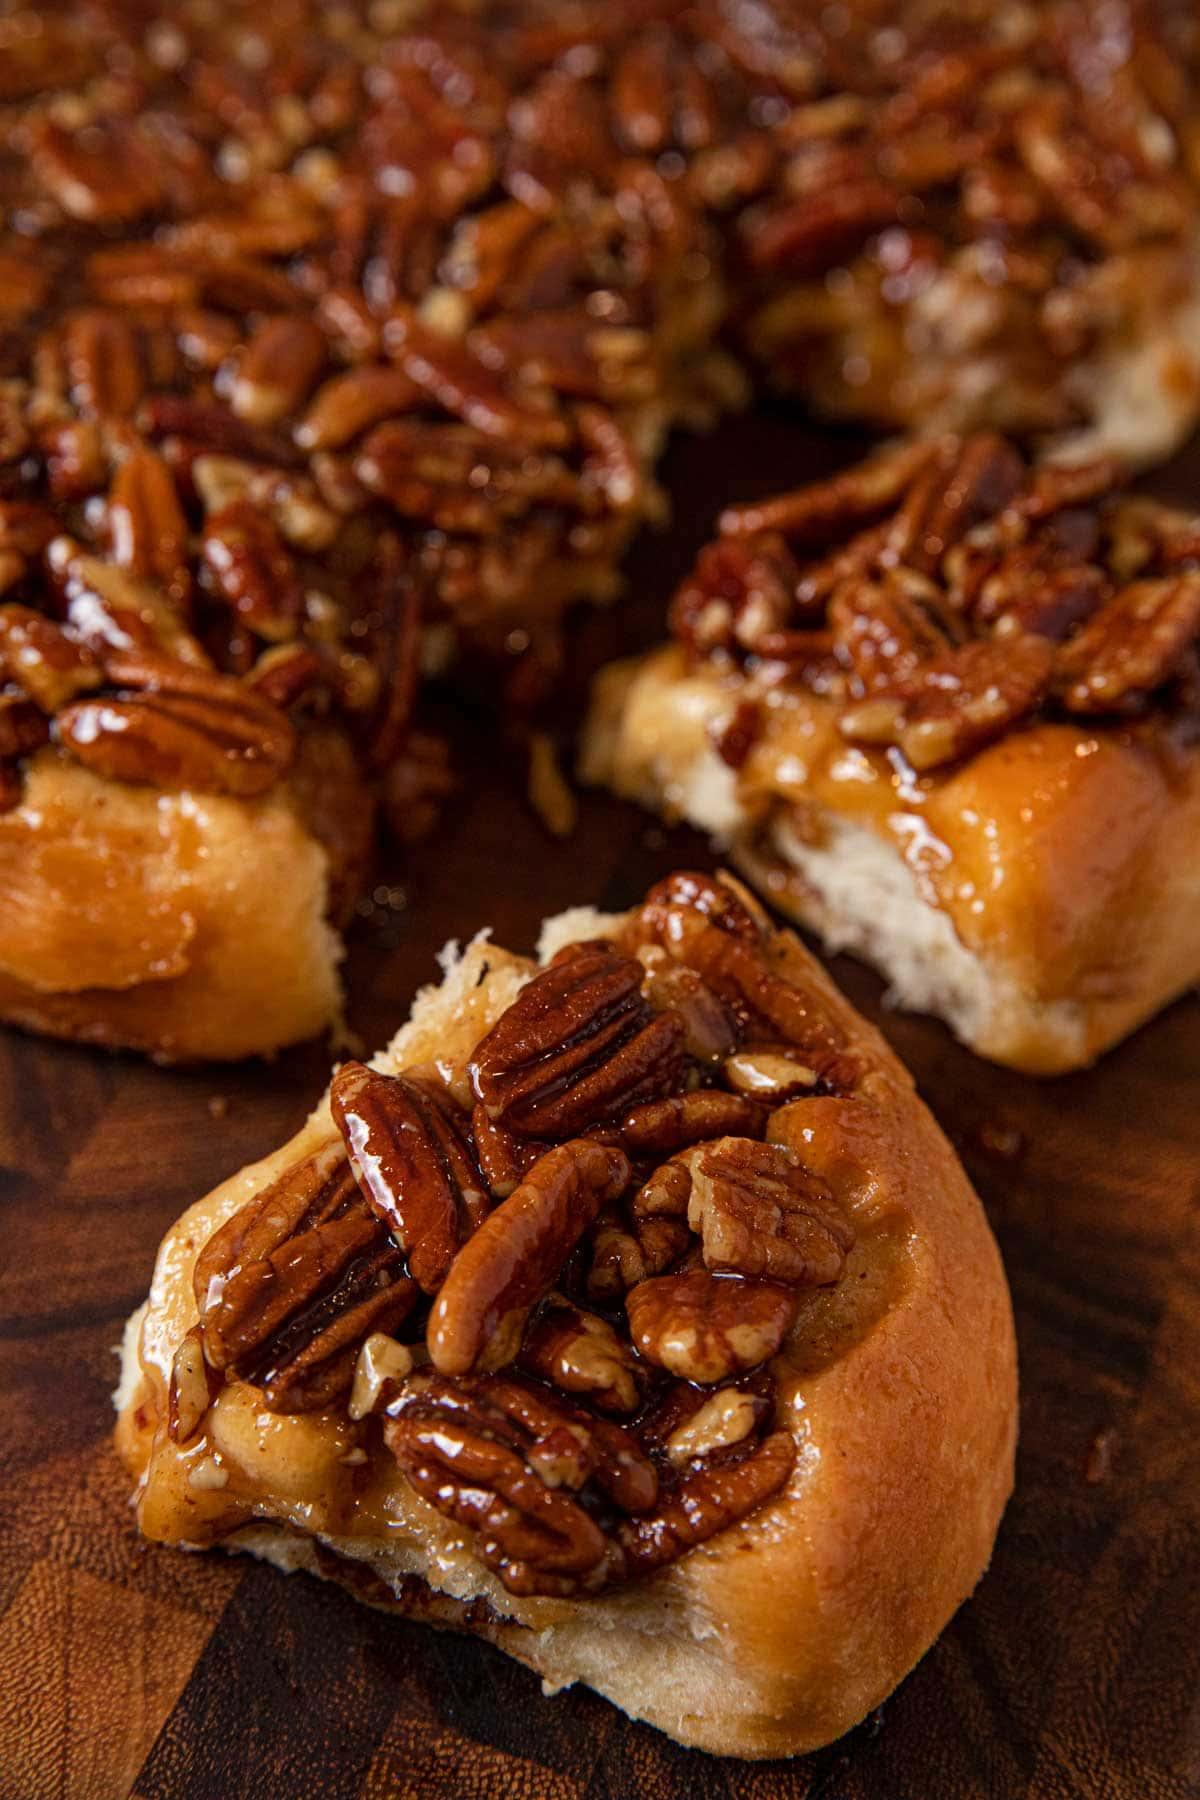 close-up of Caramel Pecan Cinnamon Roll